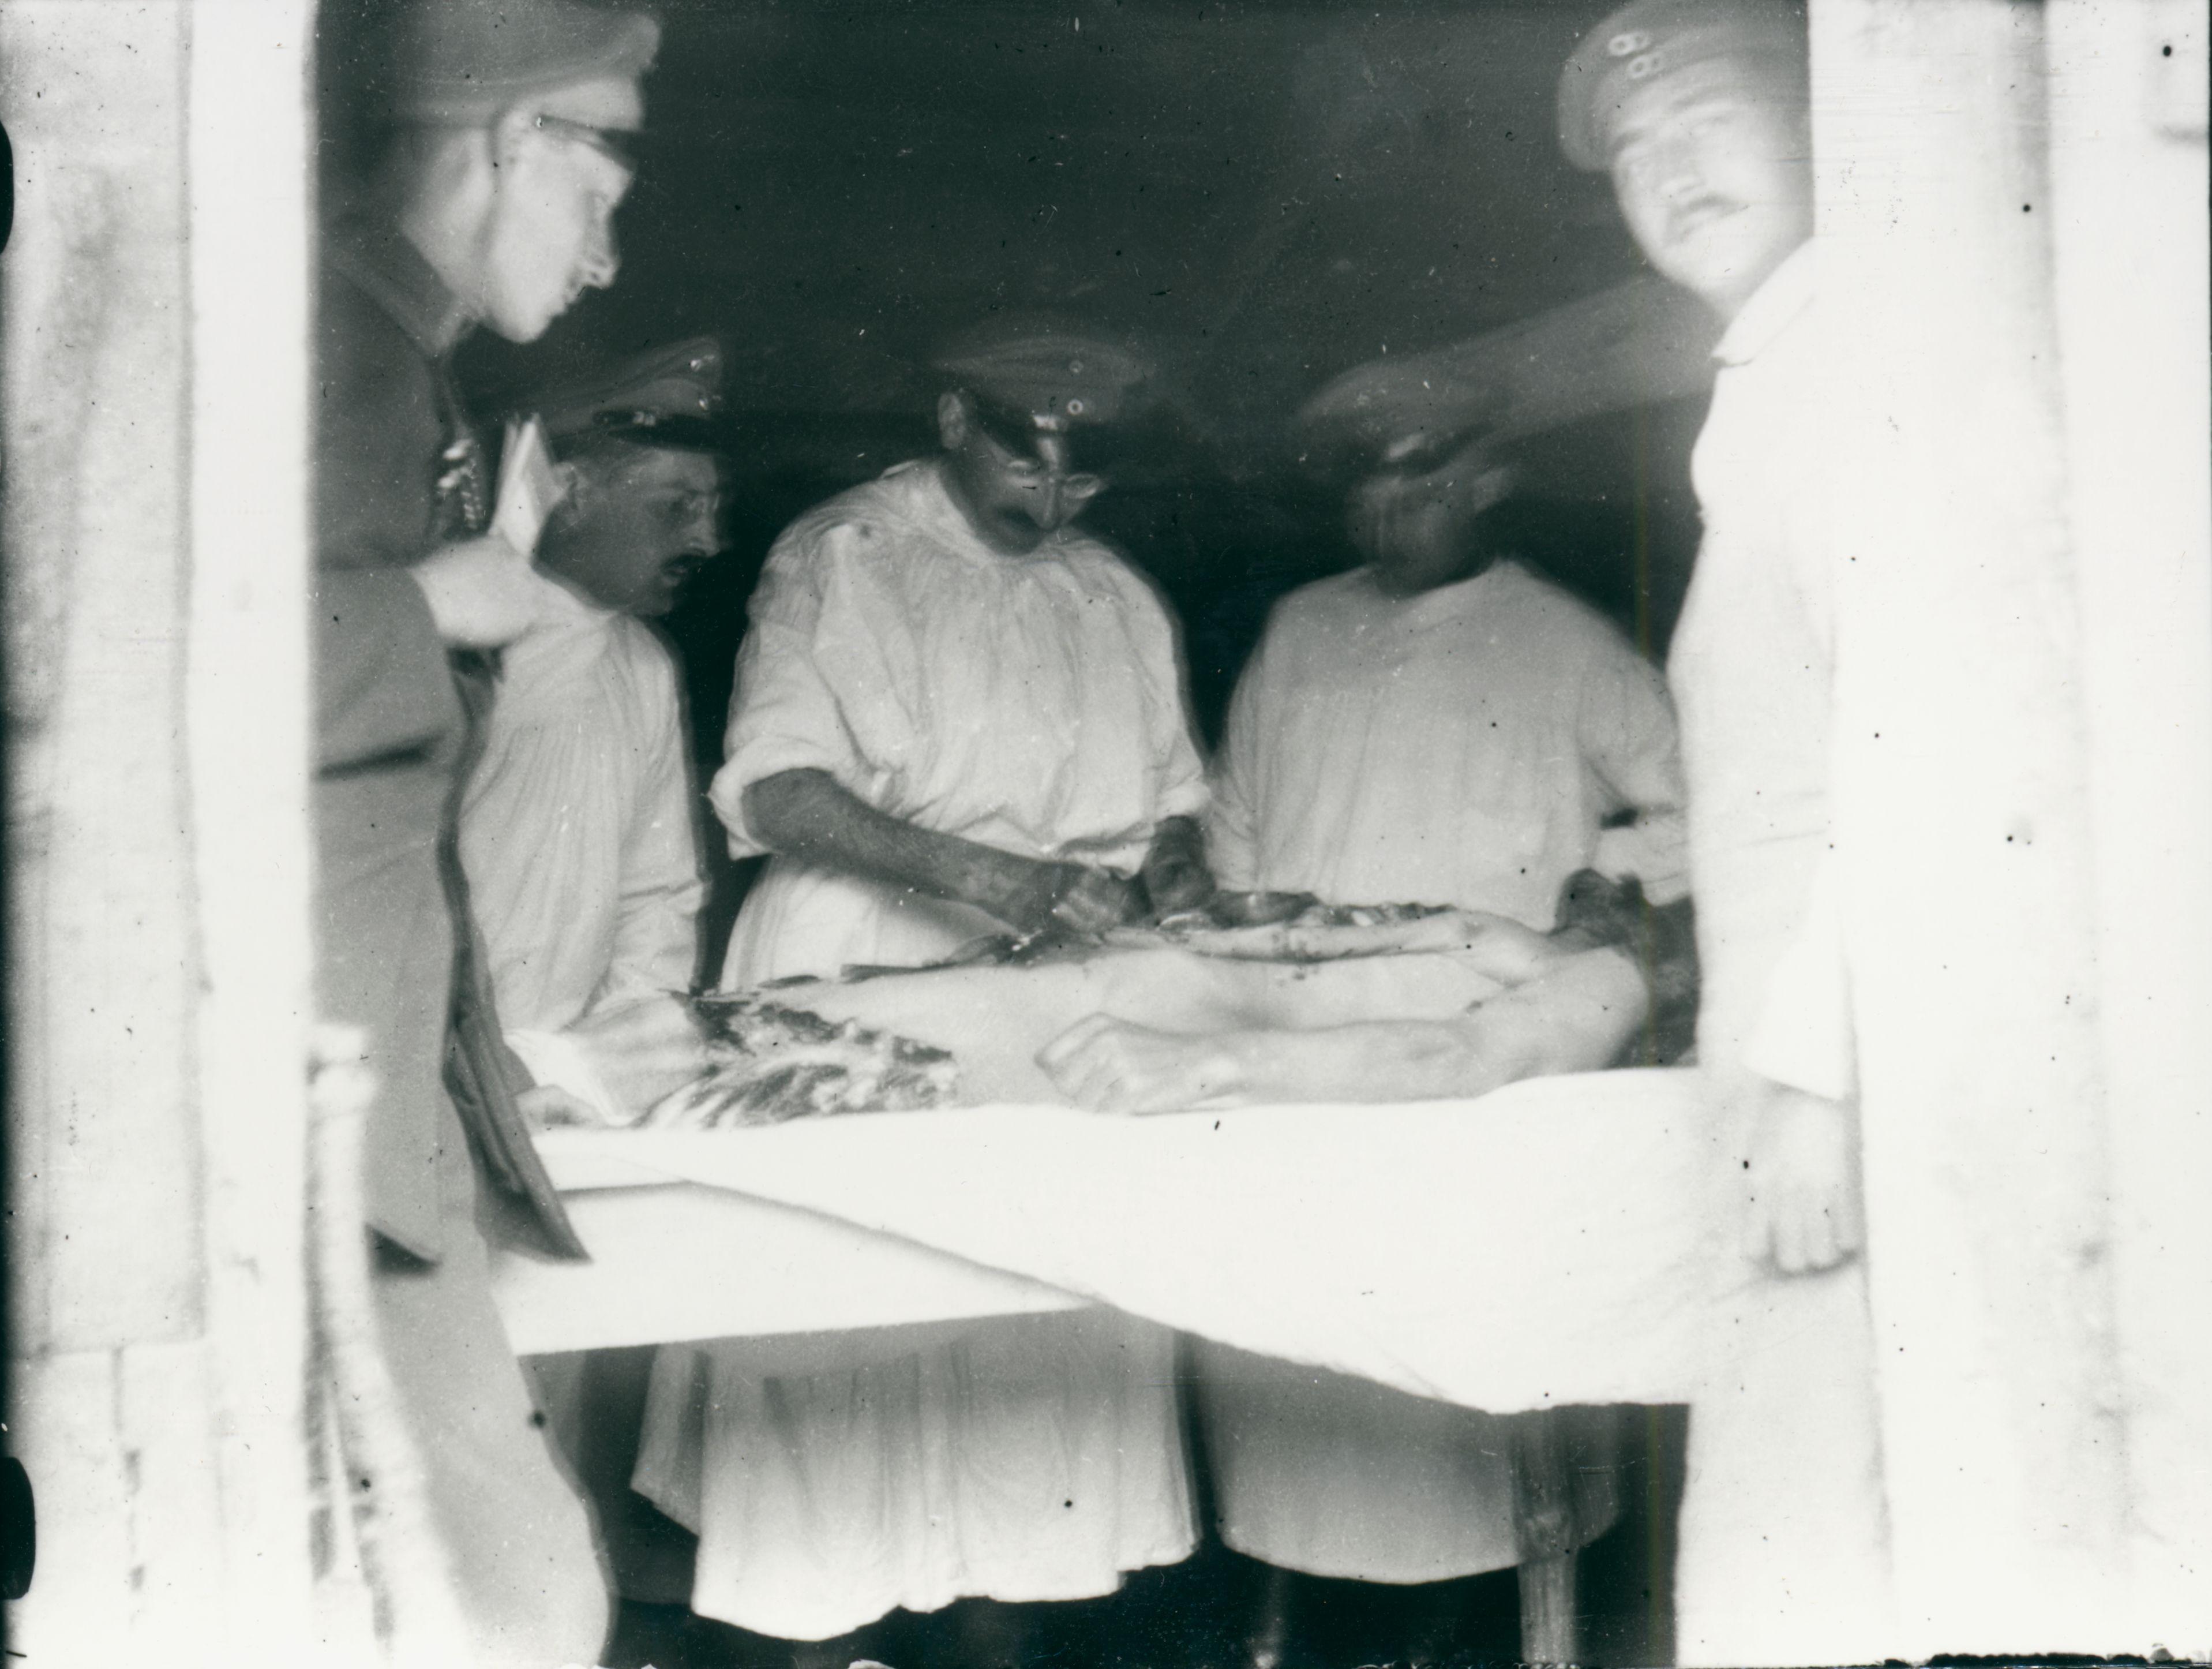 12. november 1915. IR84 ved Moulin: Sanitetstjeneste